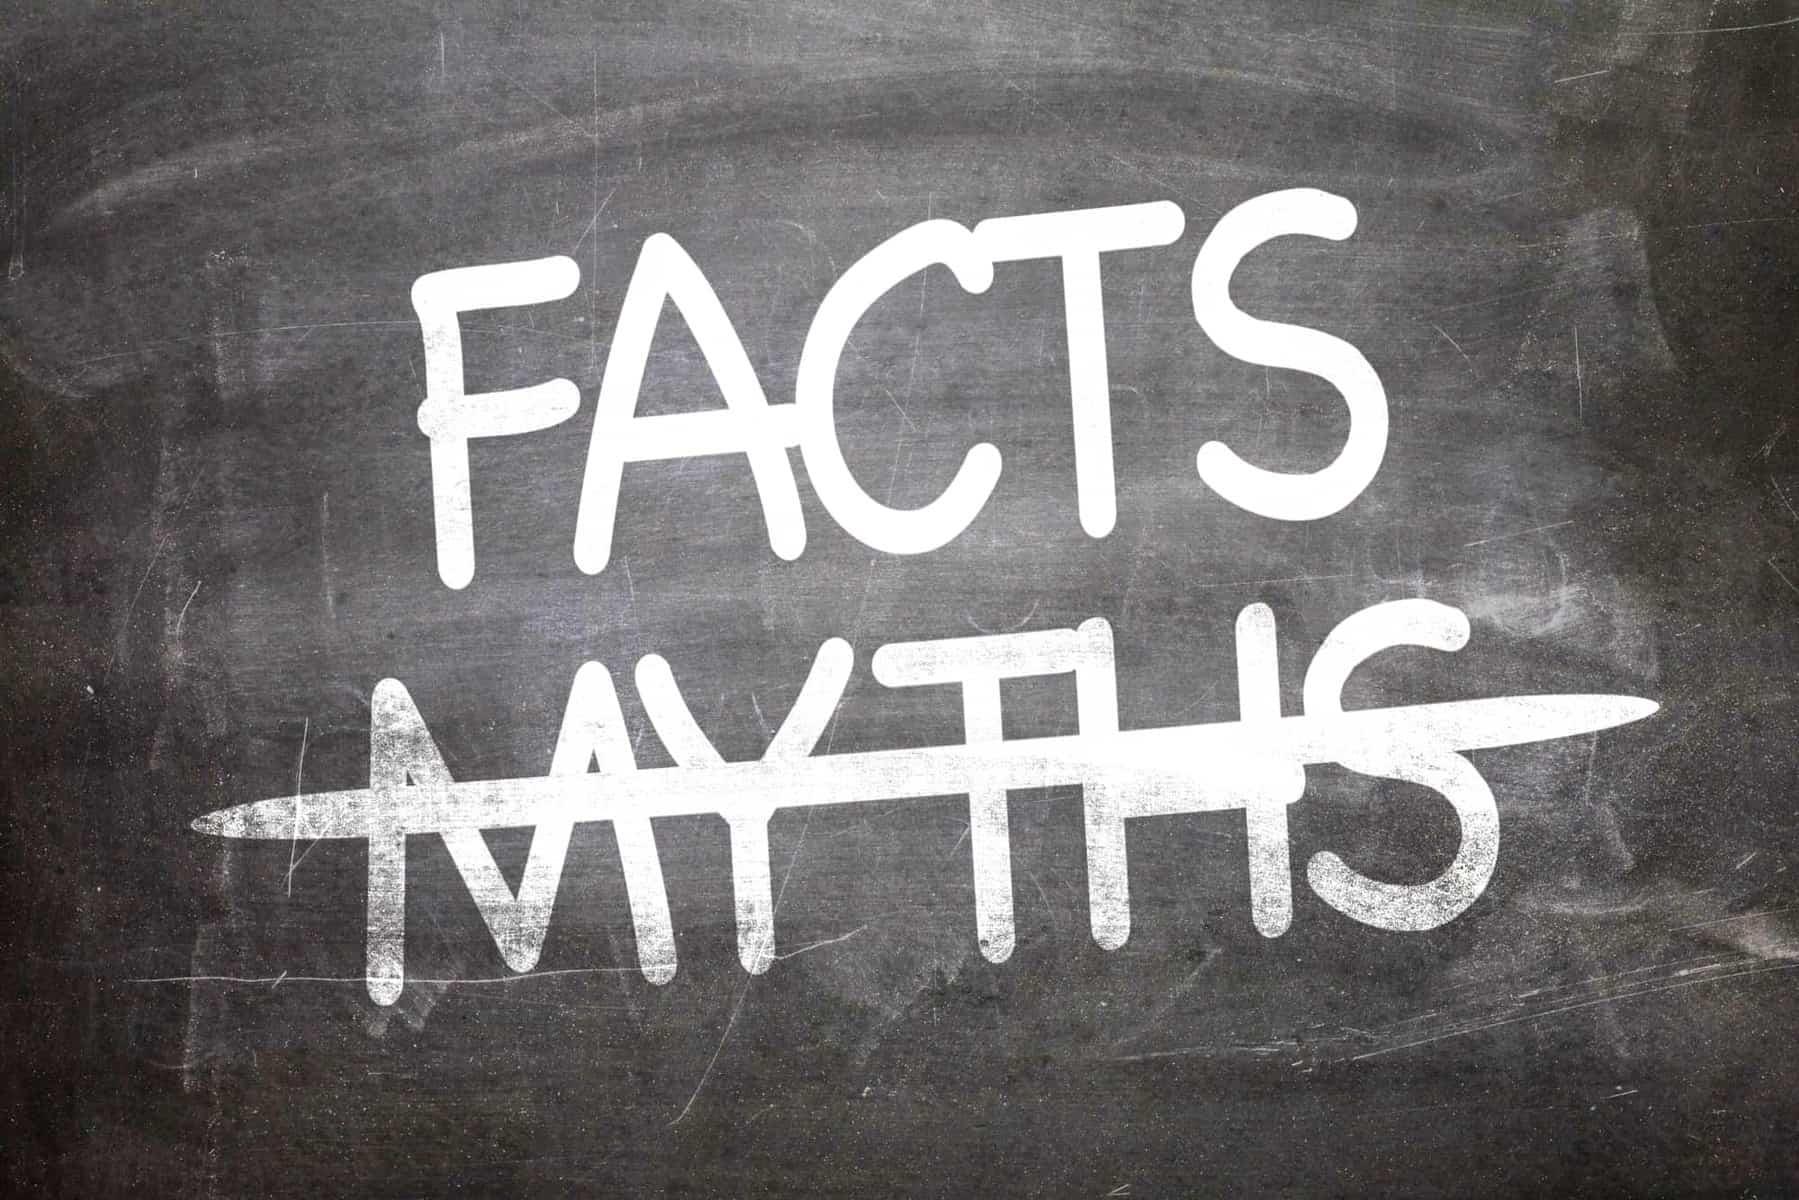 'kayaking myths' written on chalk board